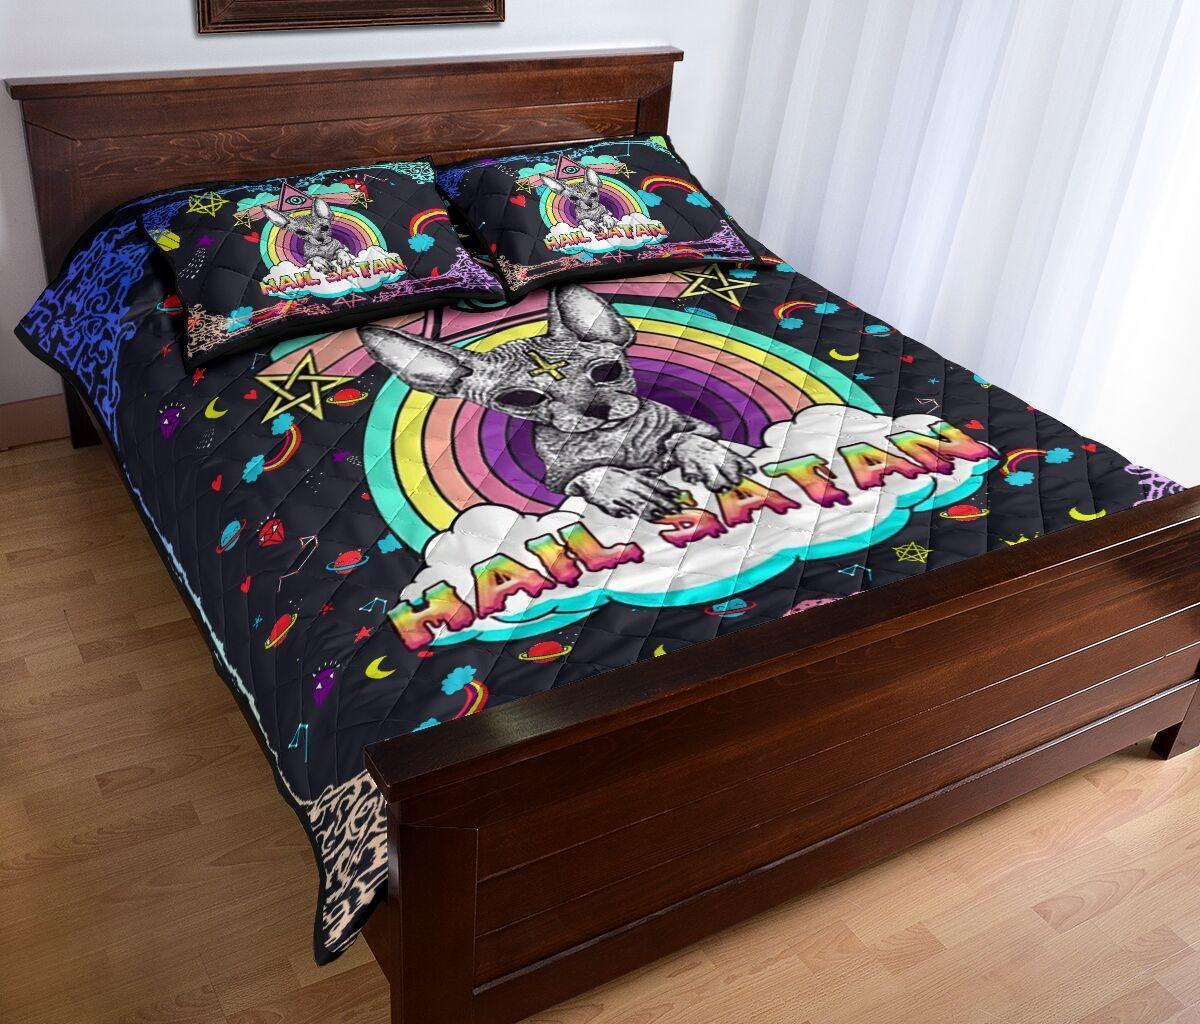 Sphyn hail satan quilt bedding set2